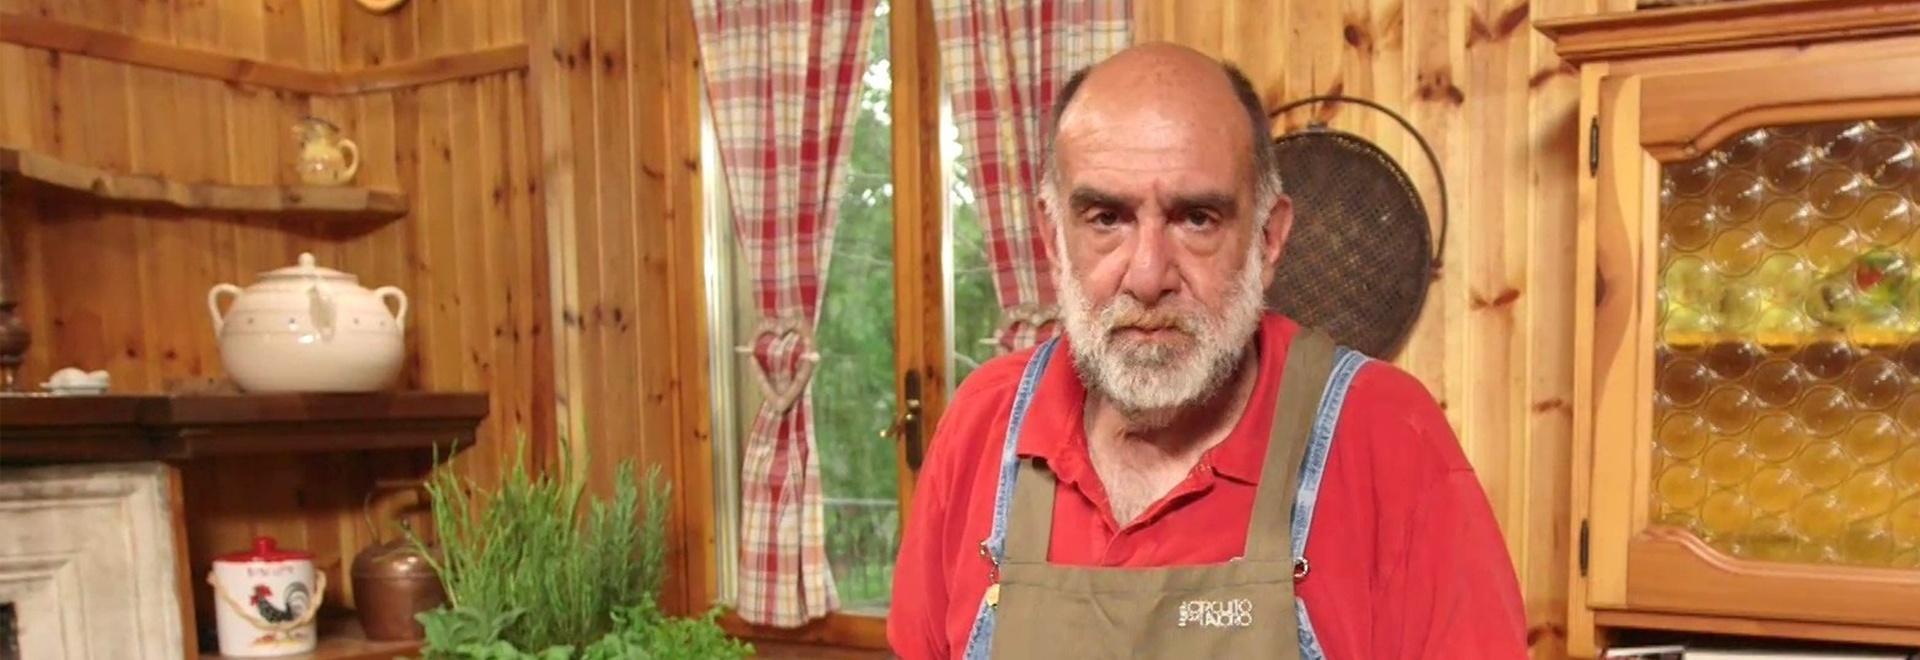 Giorgione: orto e cucina - Umbria